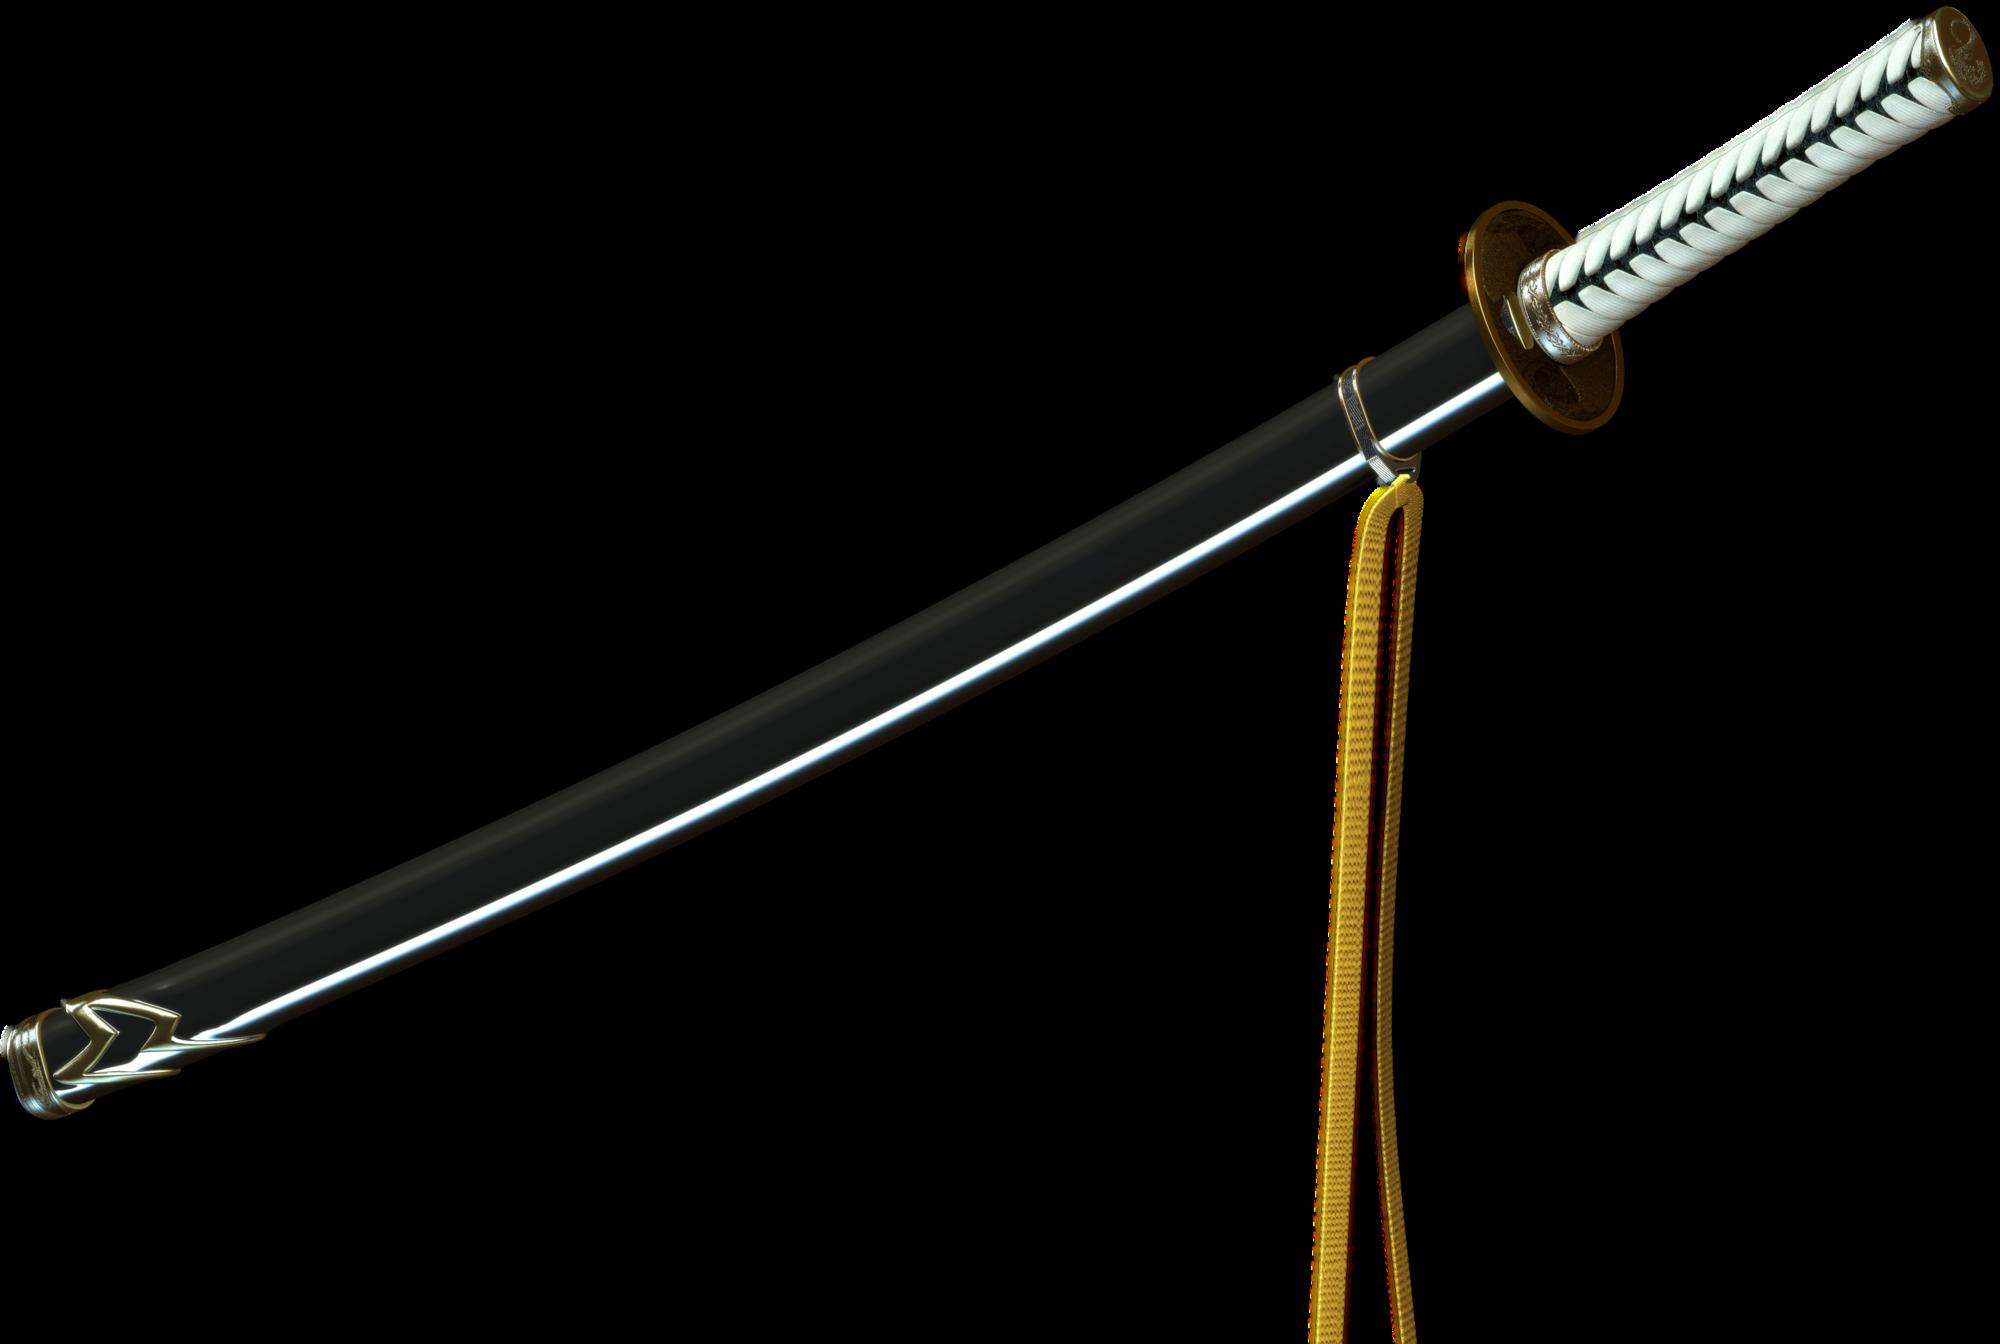 Vergil Yamato Sword Hd Wallpaper: FANDOM Powered By Wikia